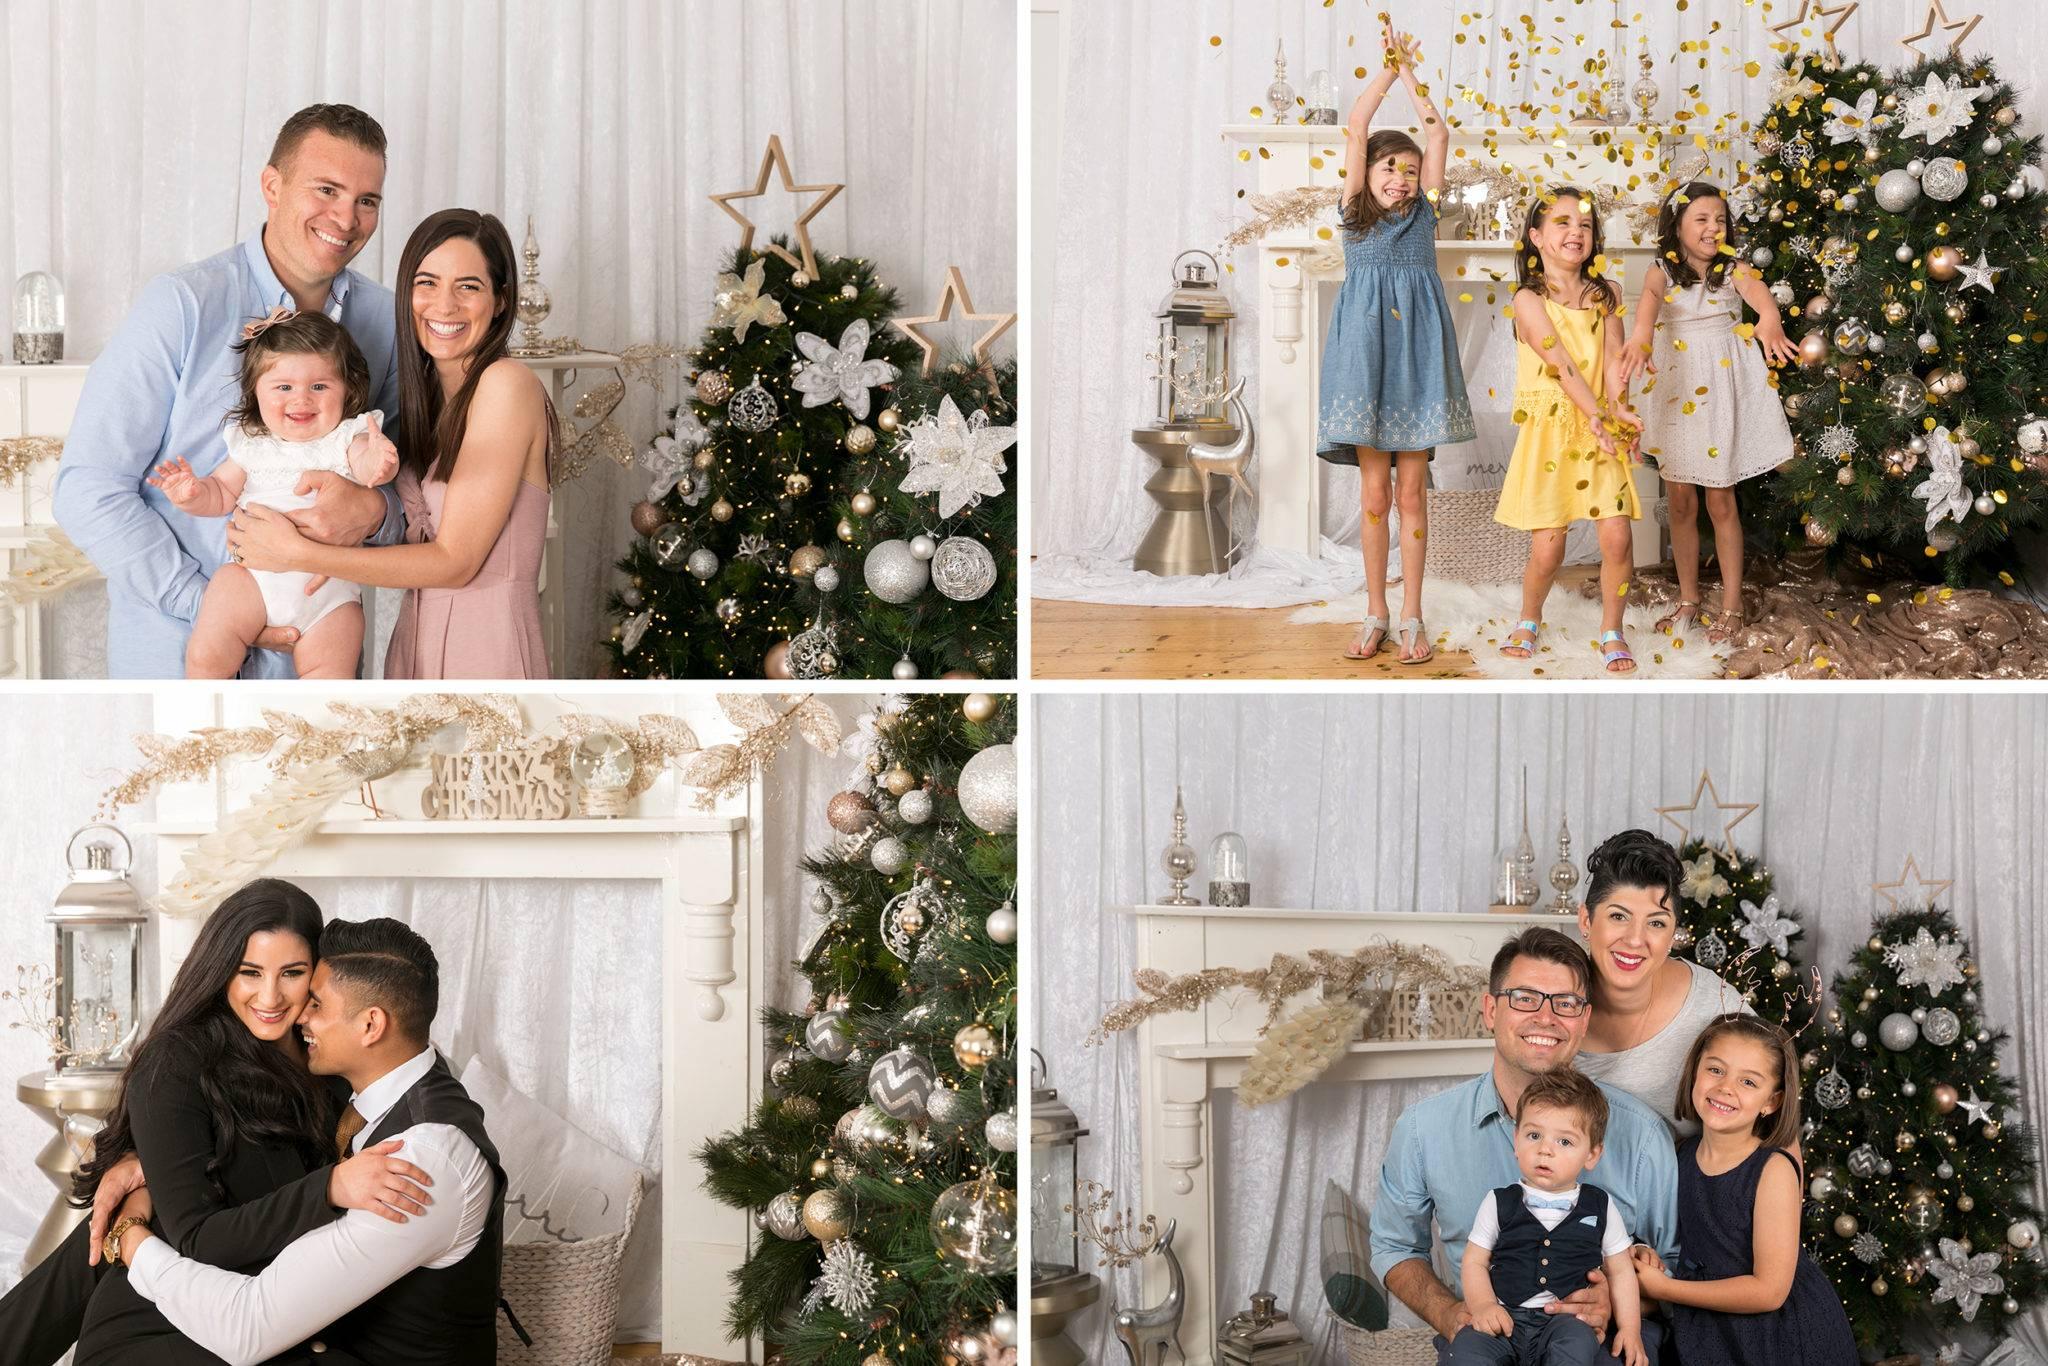 perth christmas photos 2019, perth christmas gift ideas 2019, perth christmas 2019, christmas in perth 2019